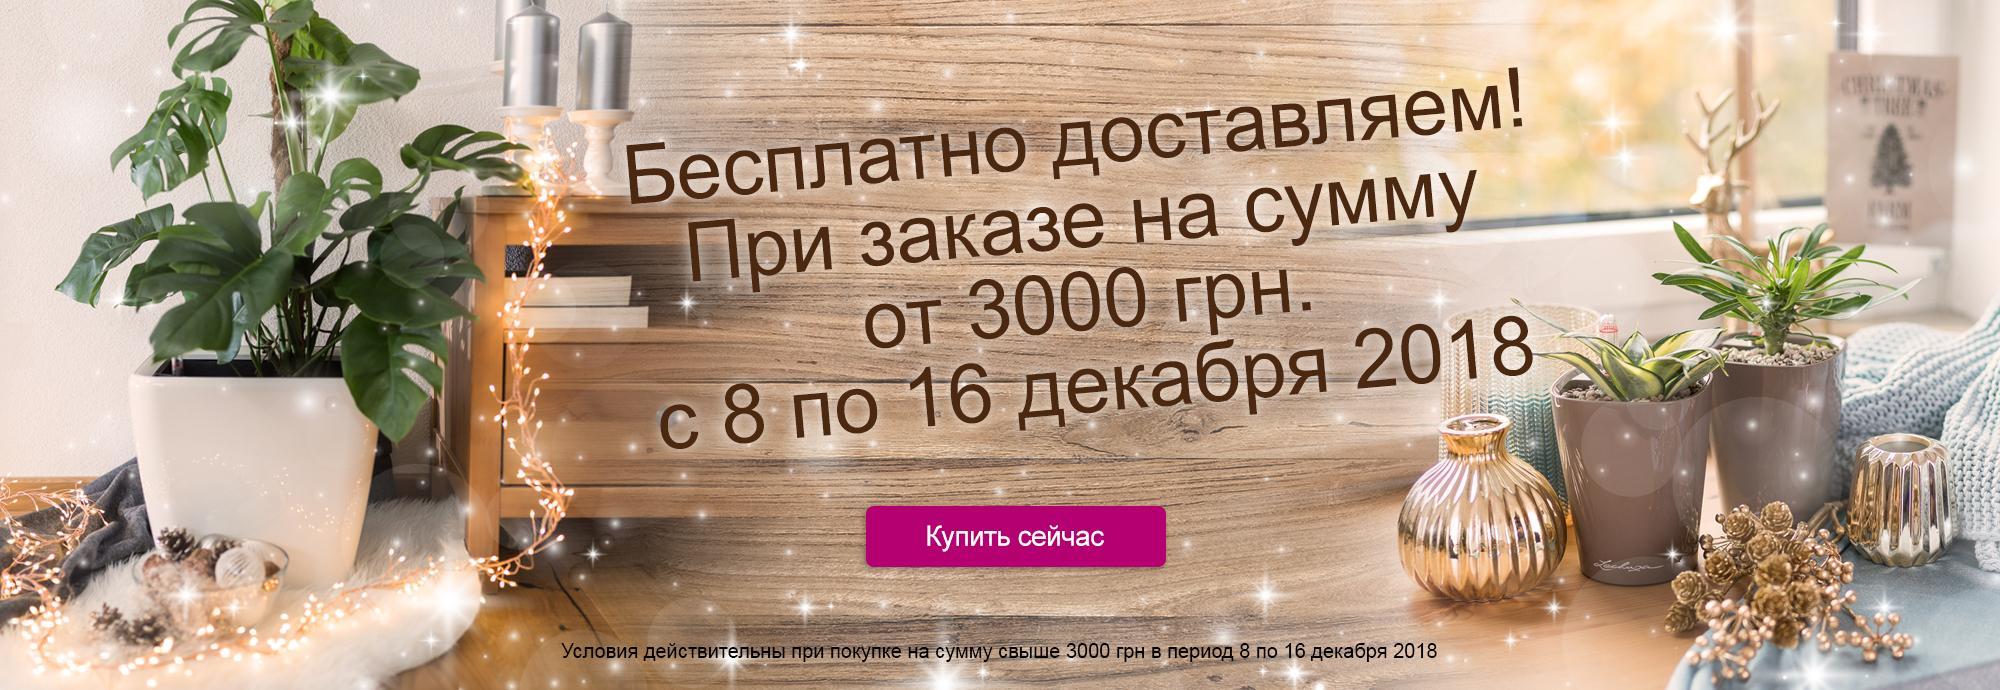 hero_banner_promo_181208_ua